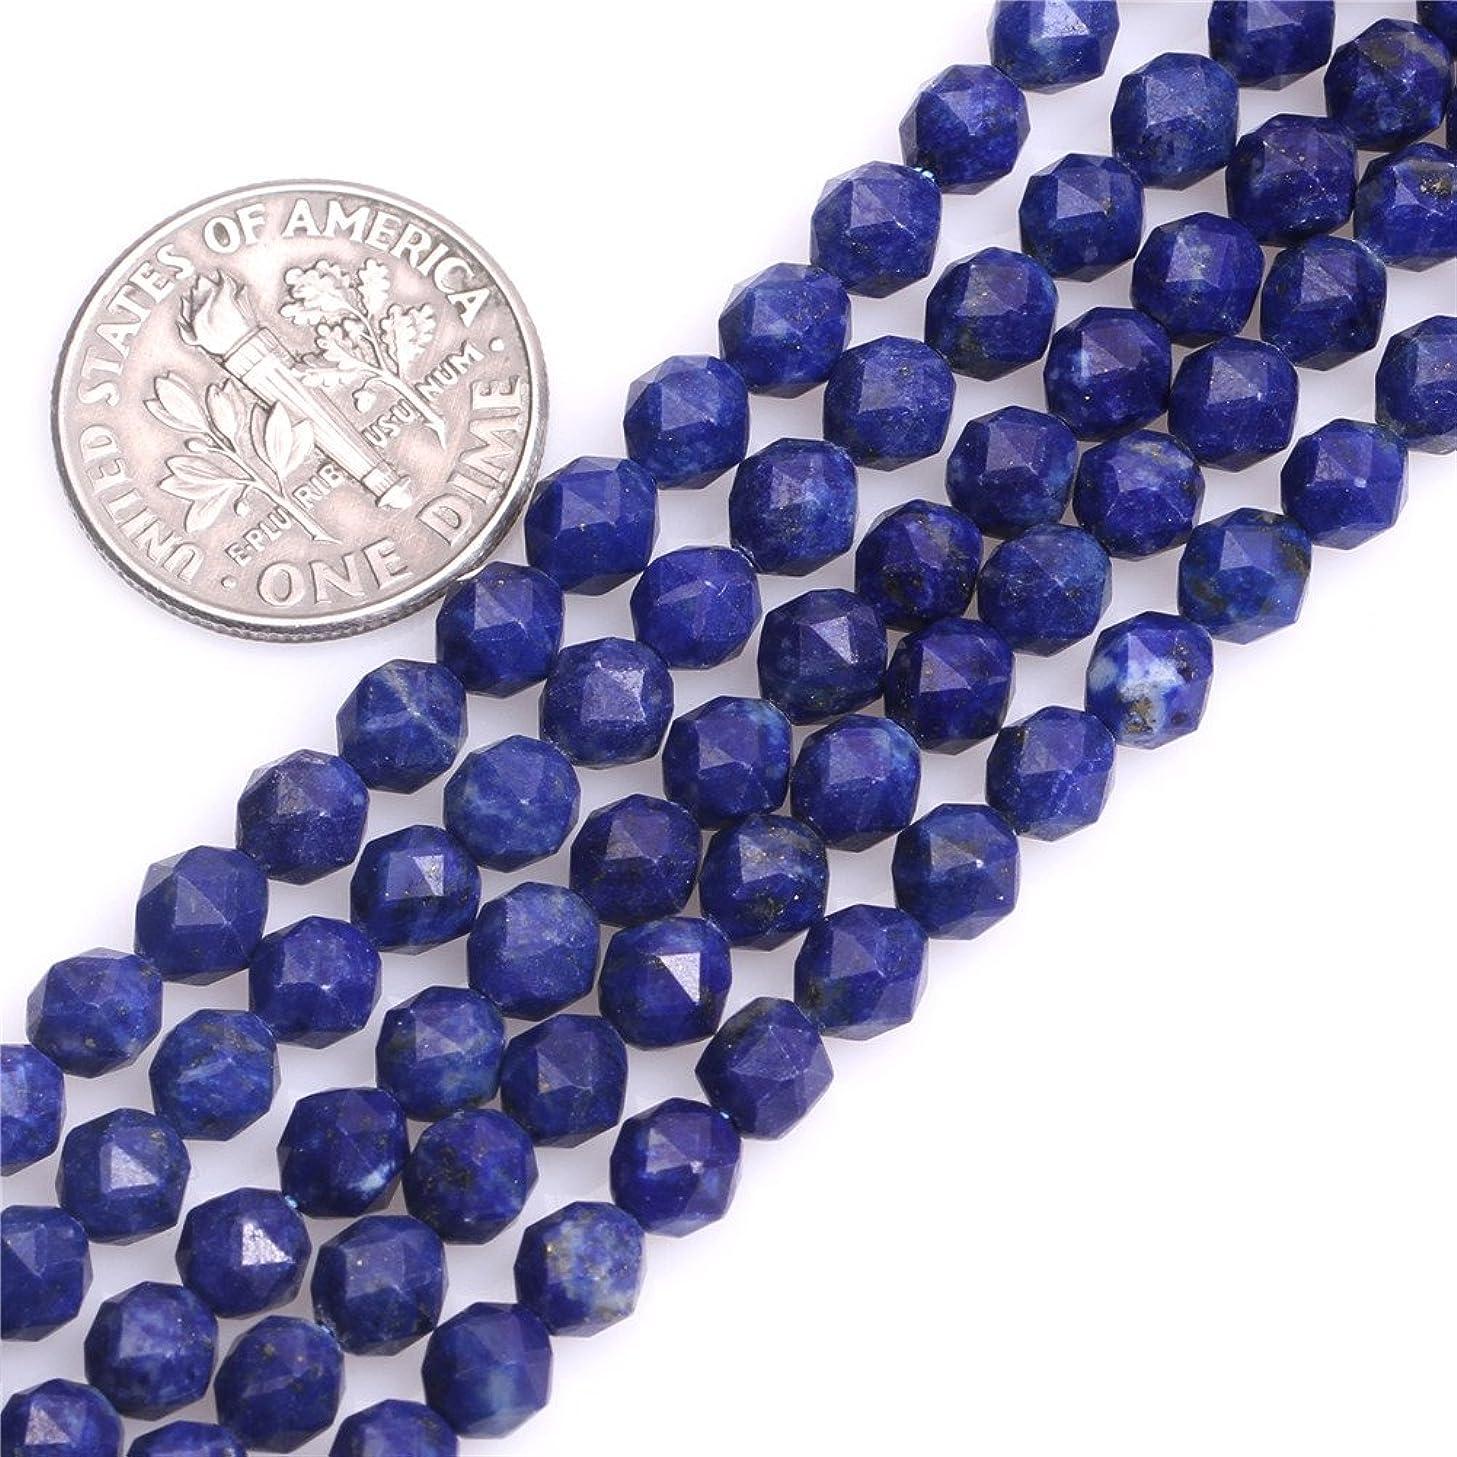 JOE FOREMAN 5mm Blue Lapis Lazuli Semi Precious Gemstone Faceted Merkaba Loose Beads for Jewelry Making DIY Handmade Craft Supplies 15